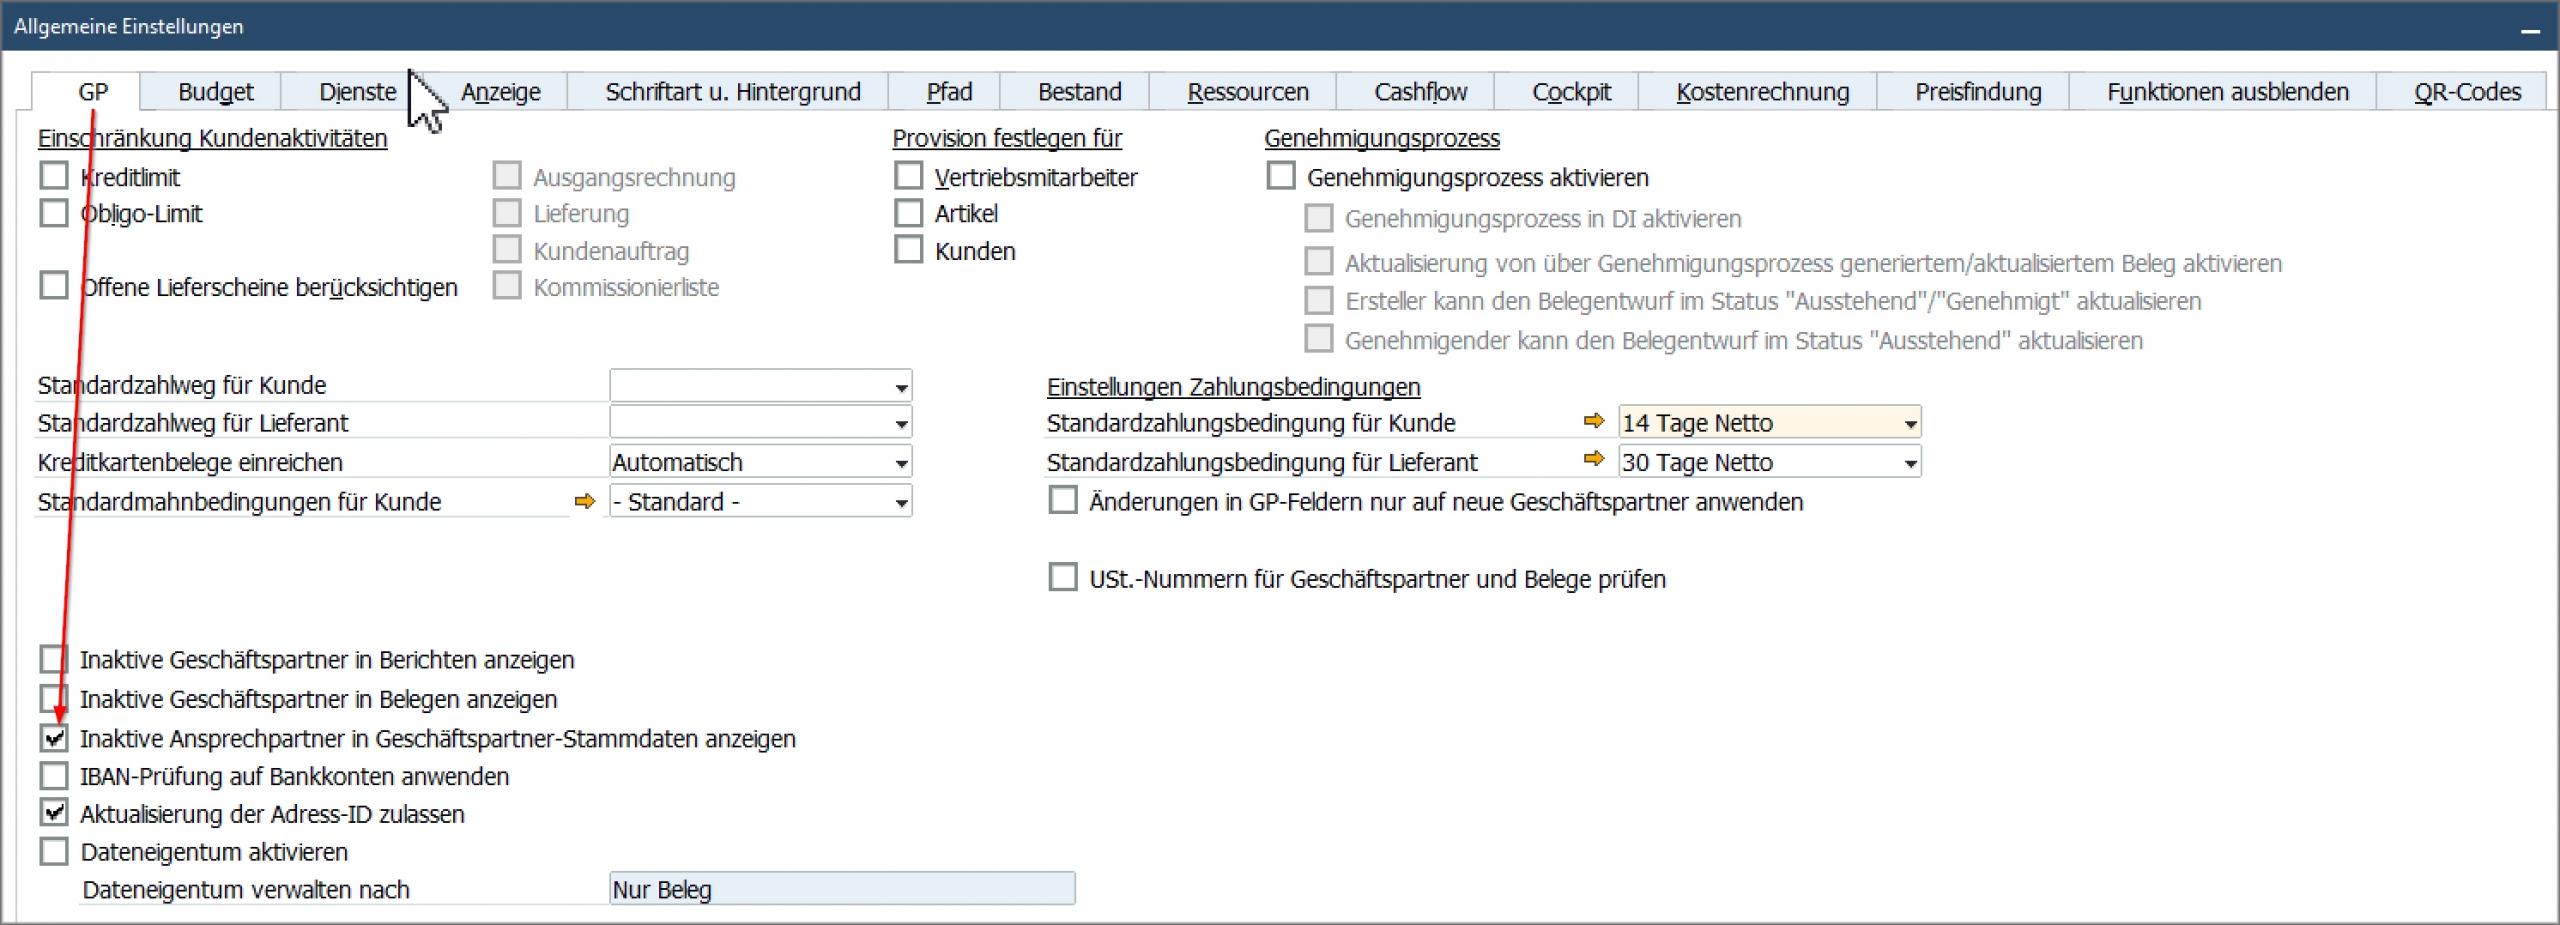 SAP Inaktive Ansprechpartner